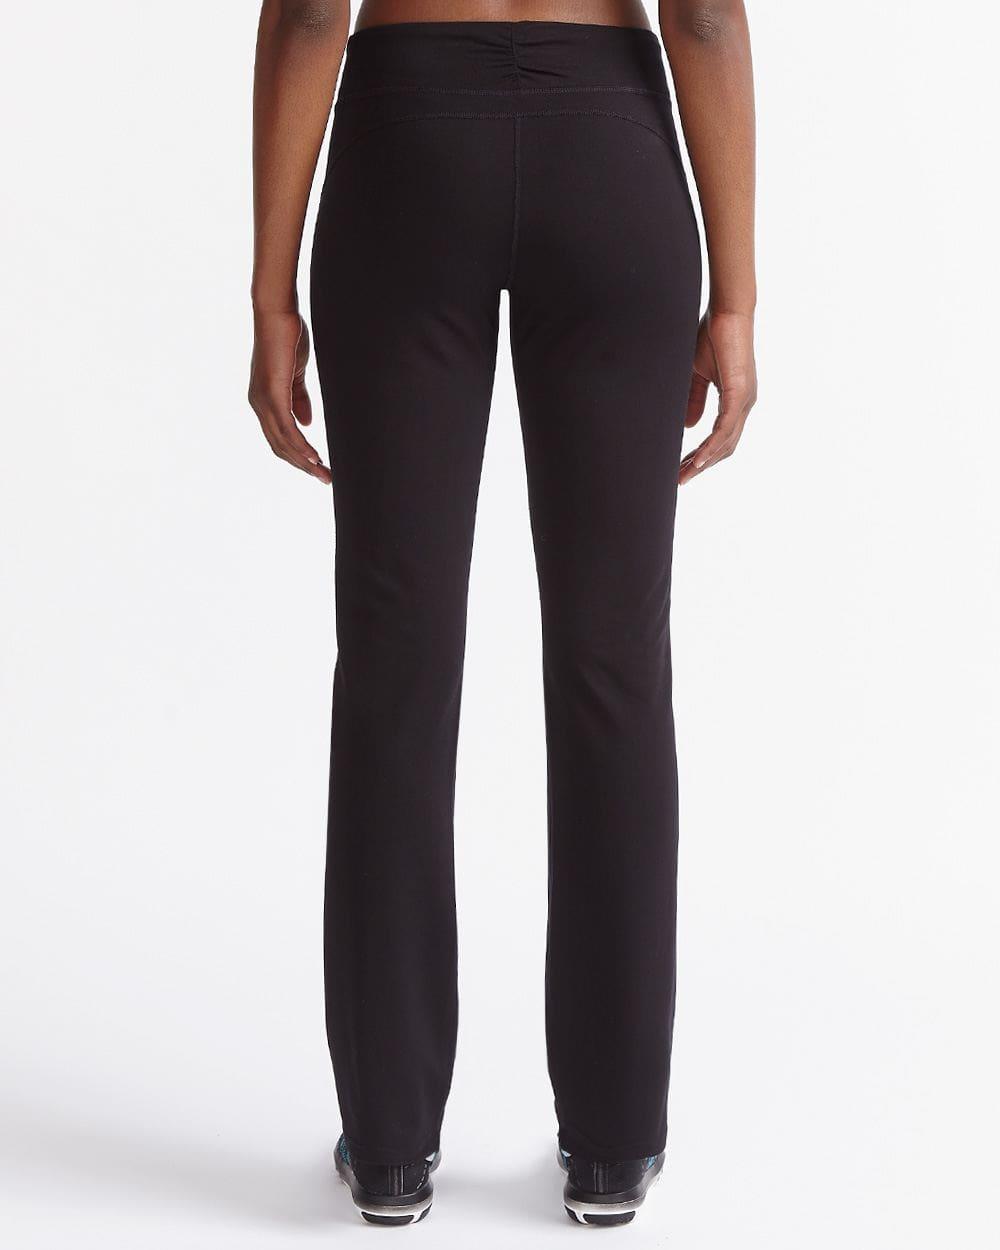 Hyba Slight Boot Yoga Pants